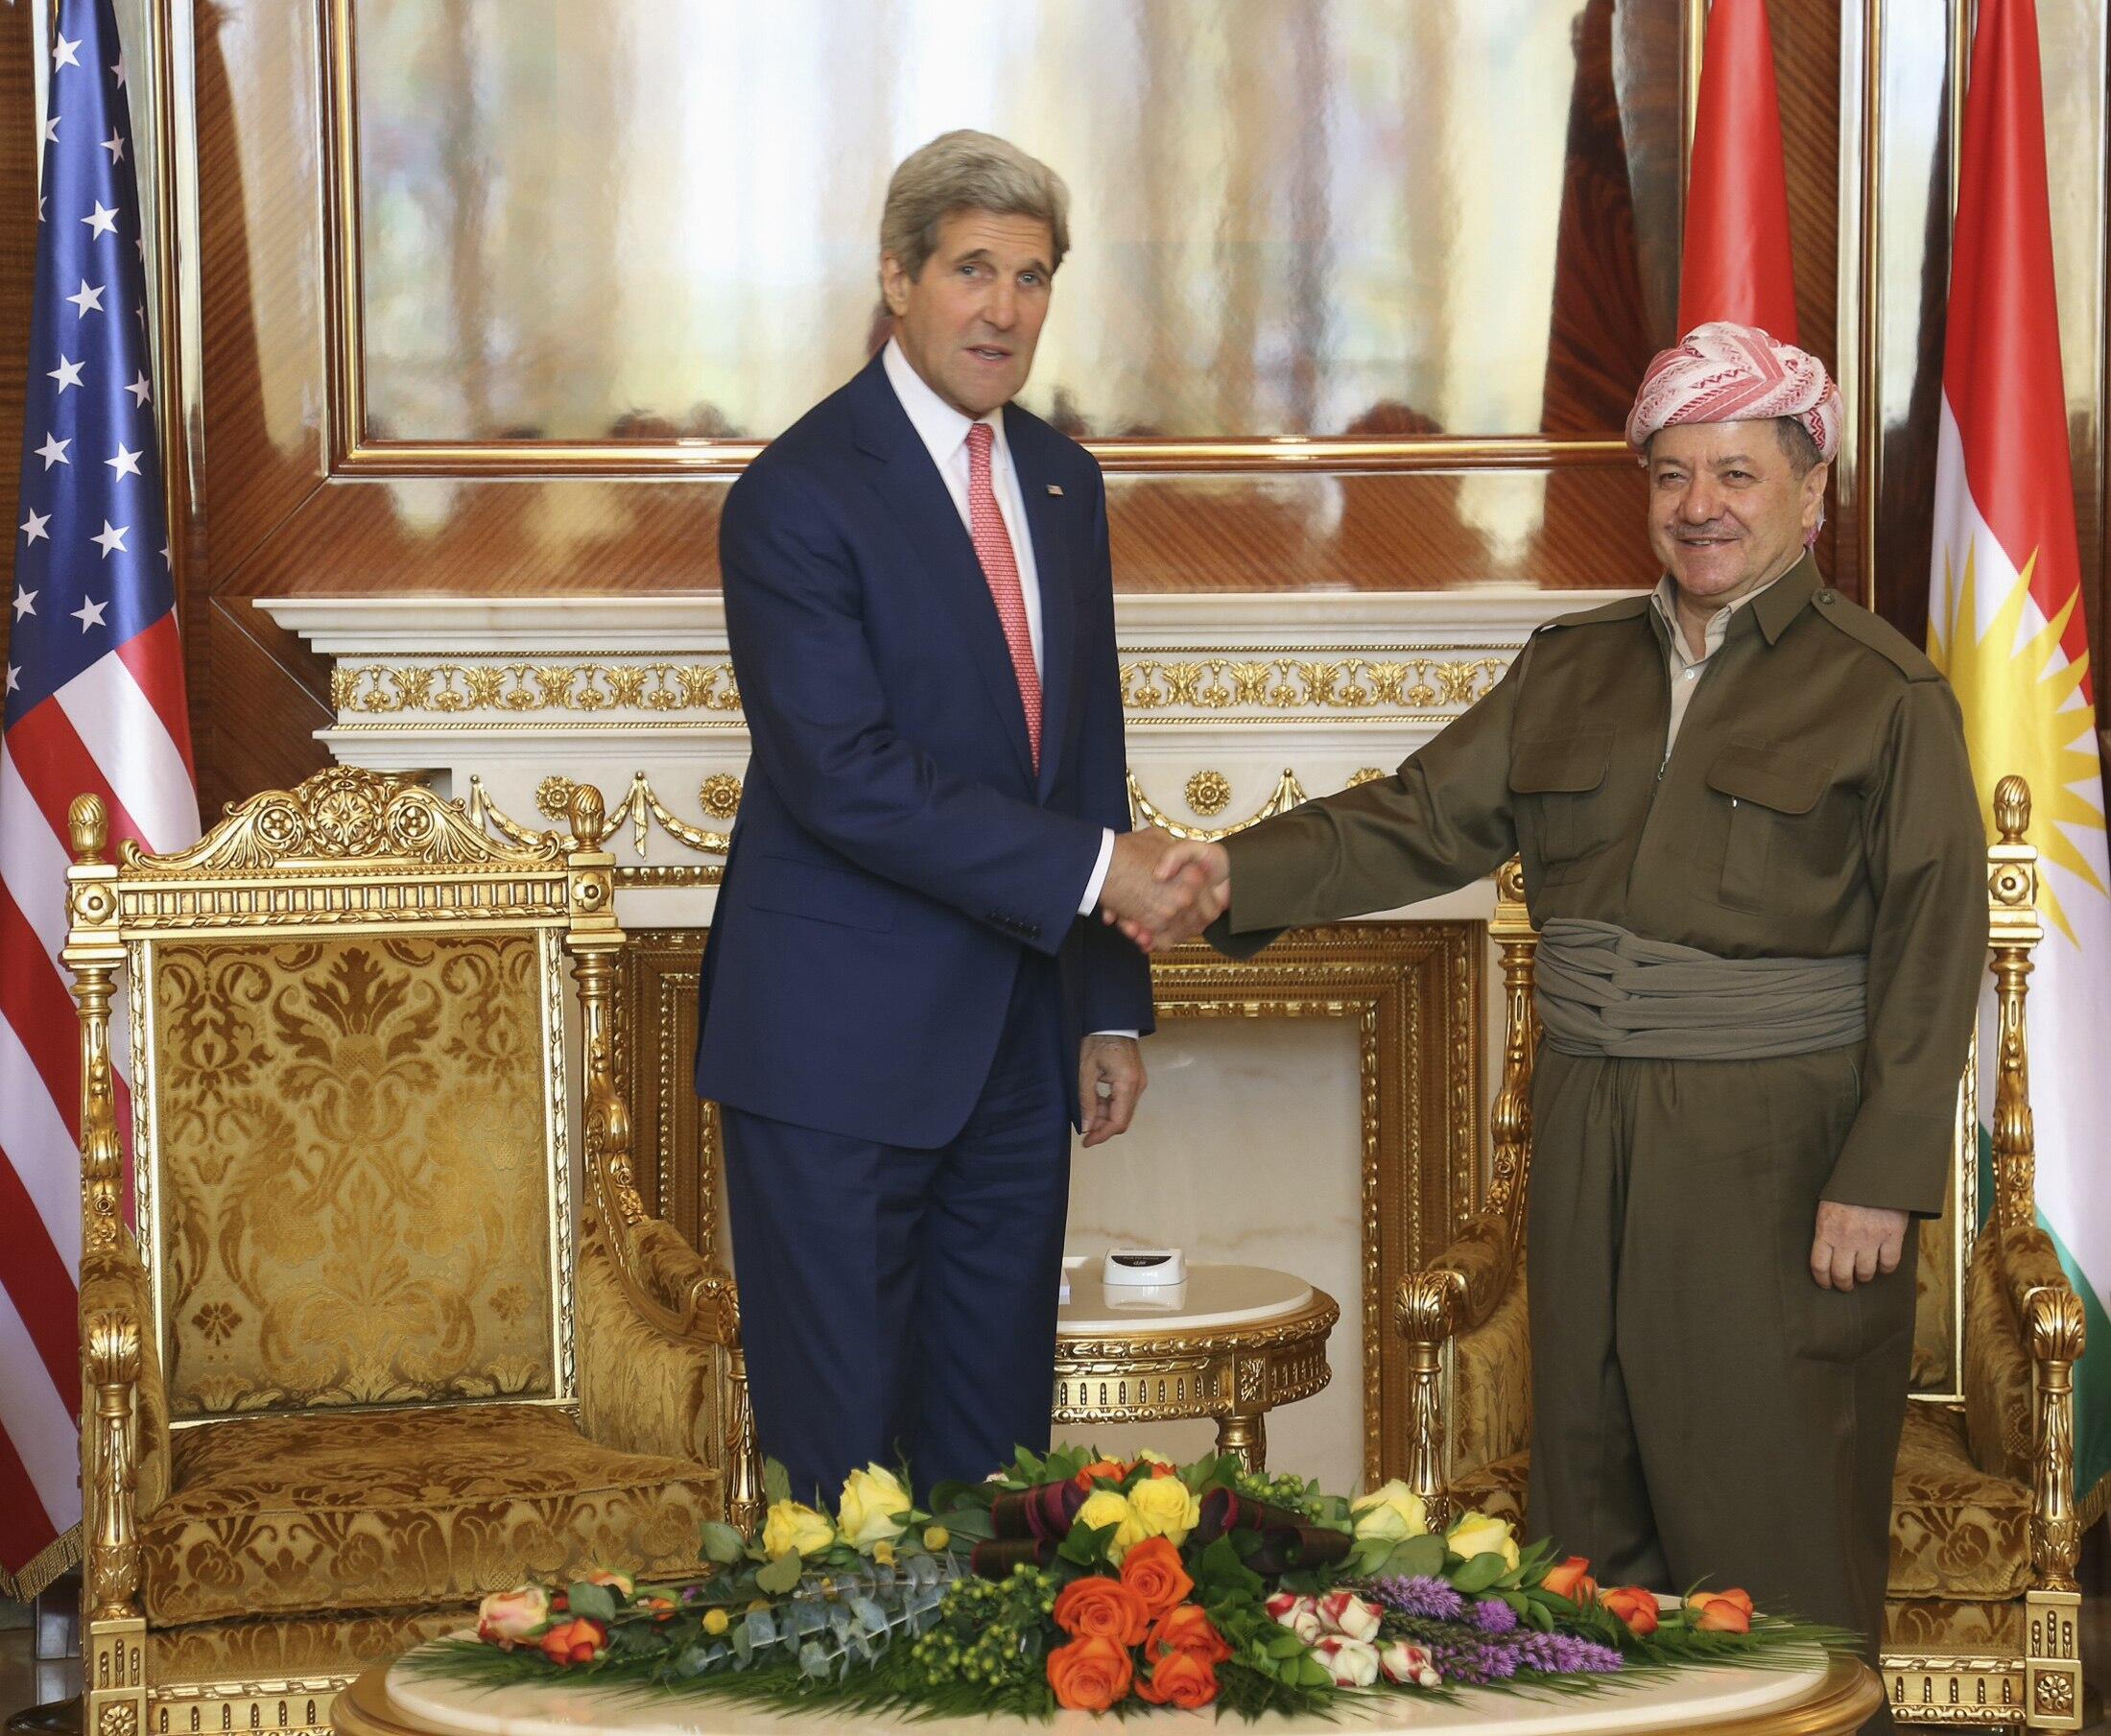 Госсекретарь США Джон Керри и президент Ирака Масуд Барзани в Эрбиле 24 июня 2014